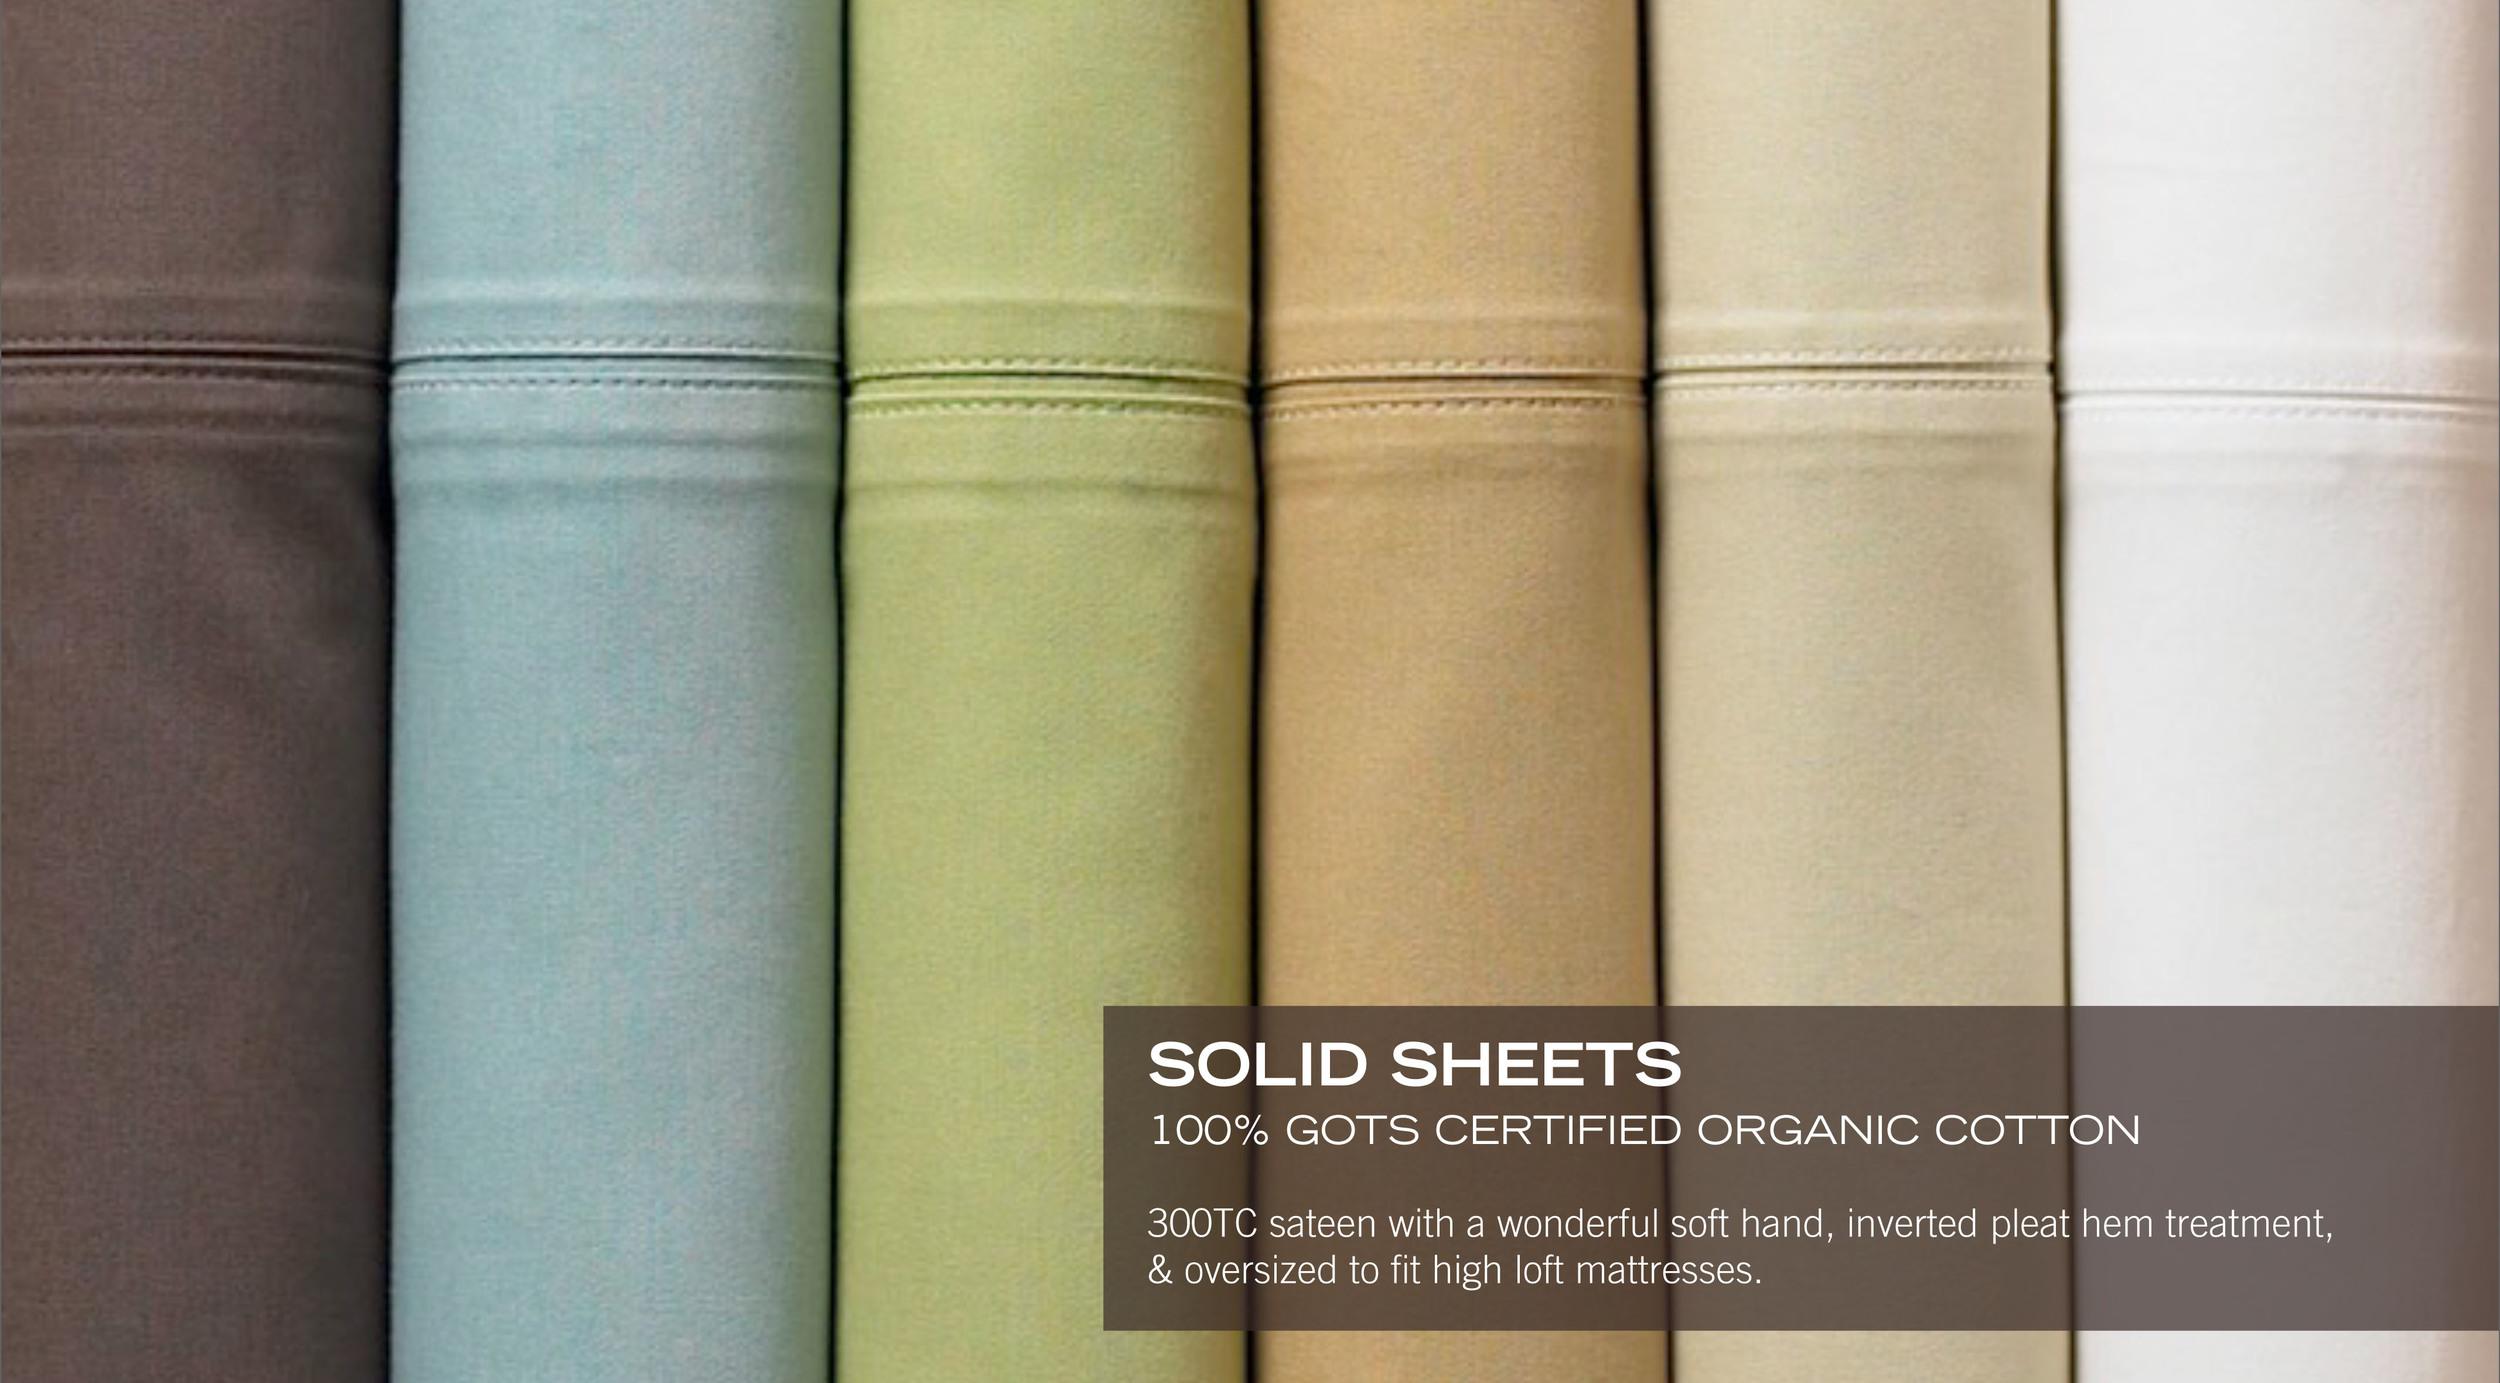 Portico-Home-organic-cotton-sheets.jpg